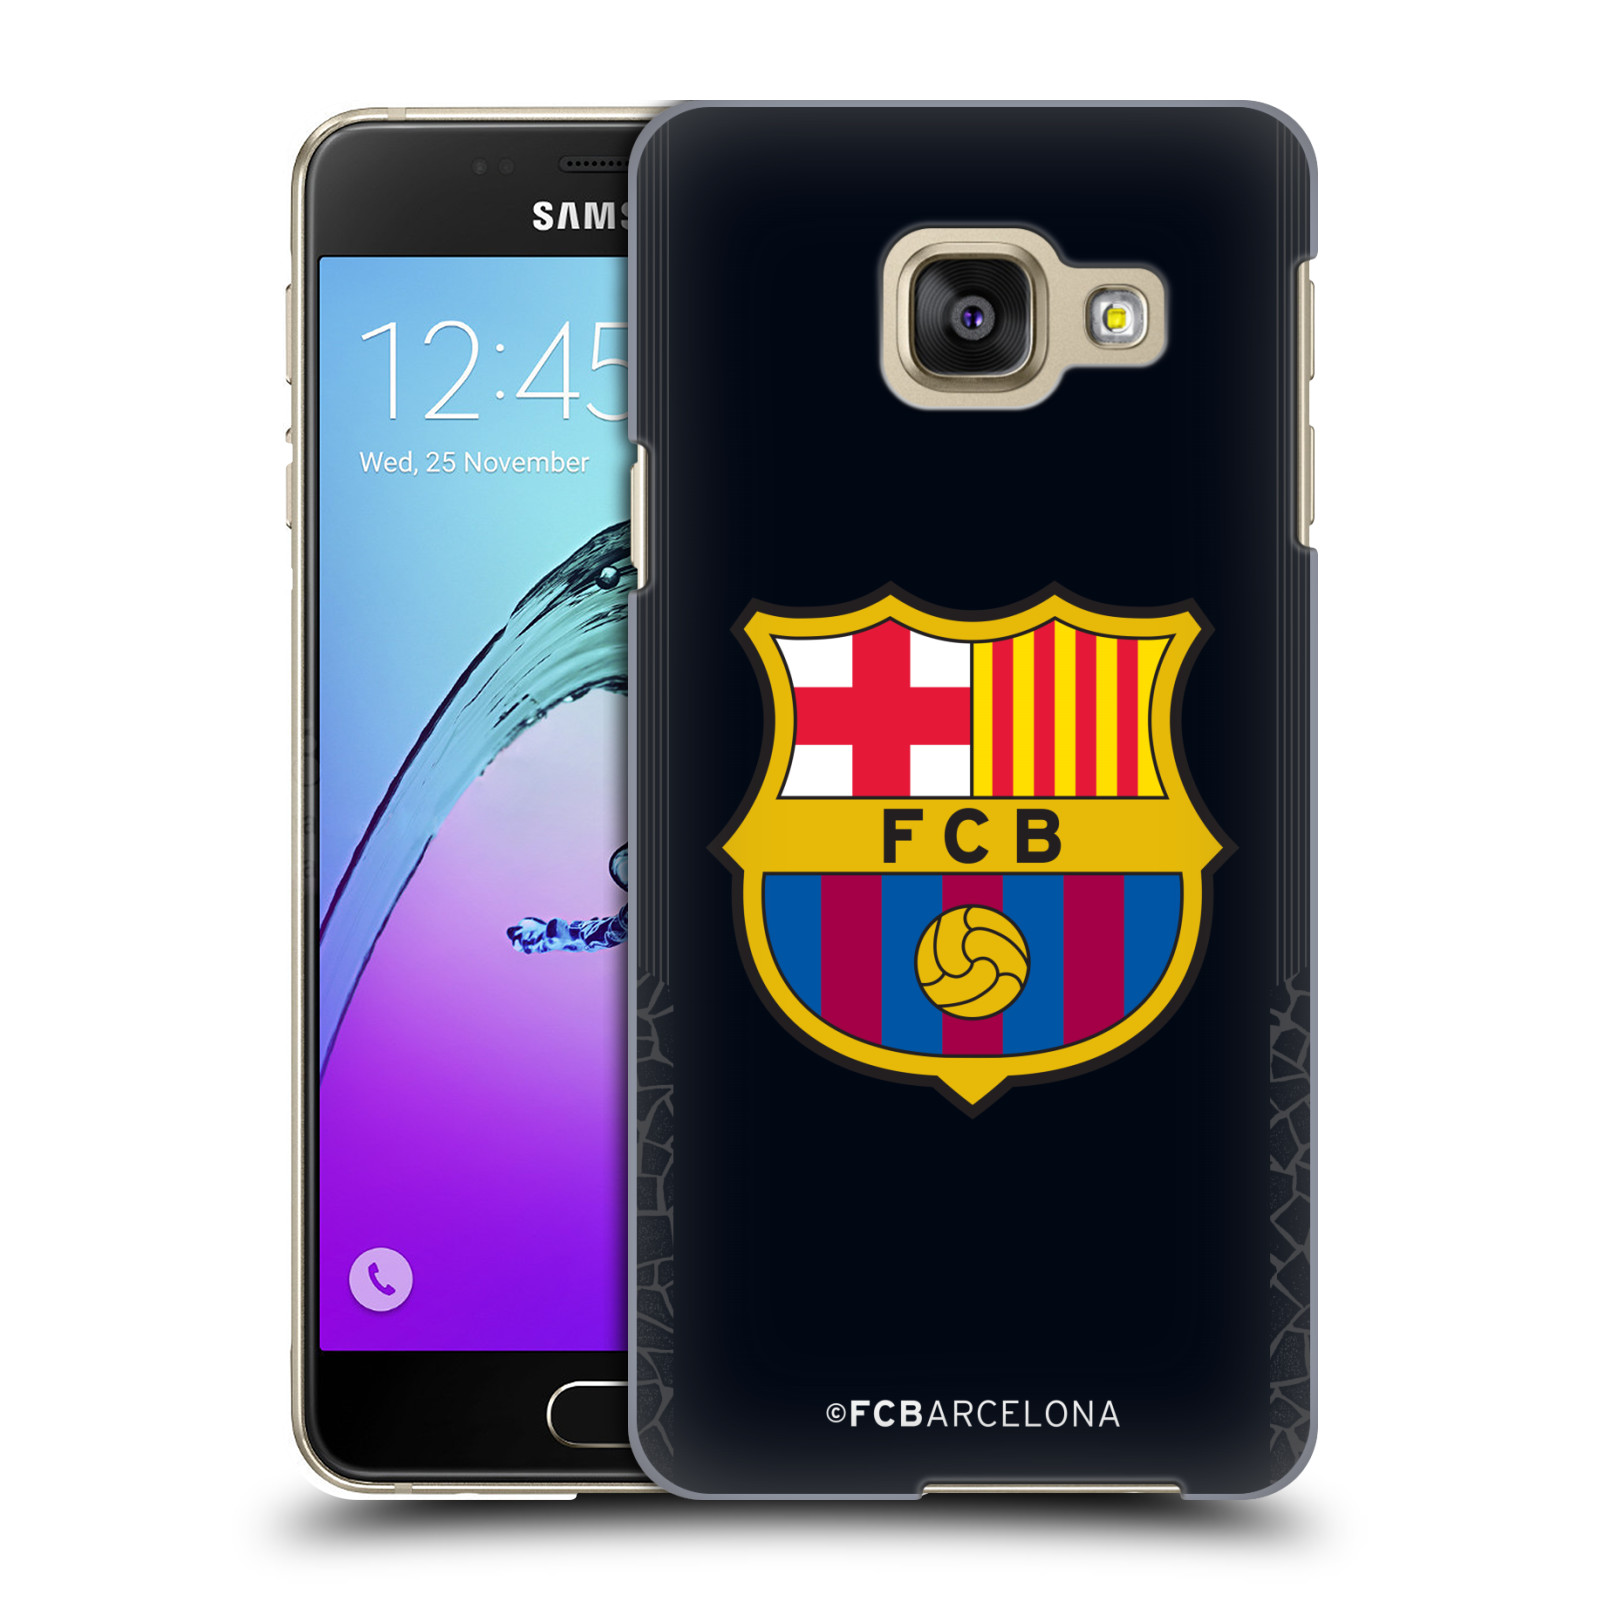 Plastové pouzdro na mobil Samsung Galaxy A3 (2016) - Head Case - FC Barcelona - Goalkeeper black logo